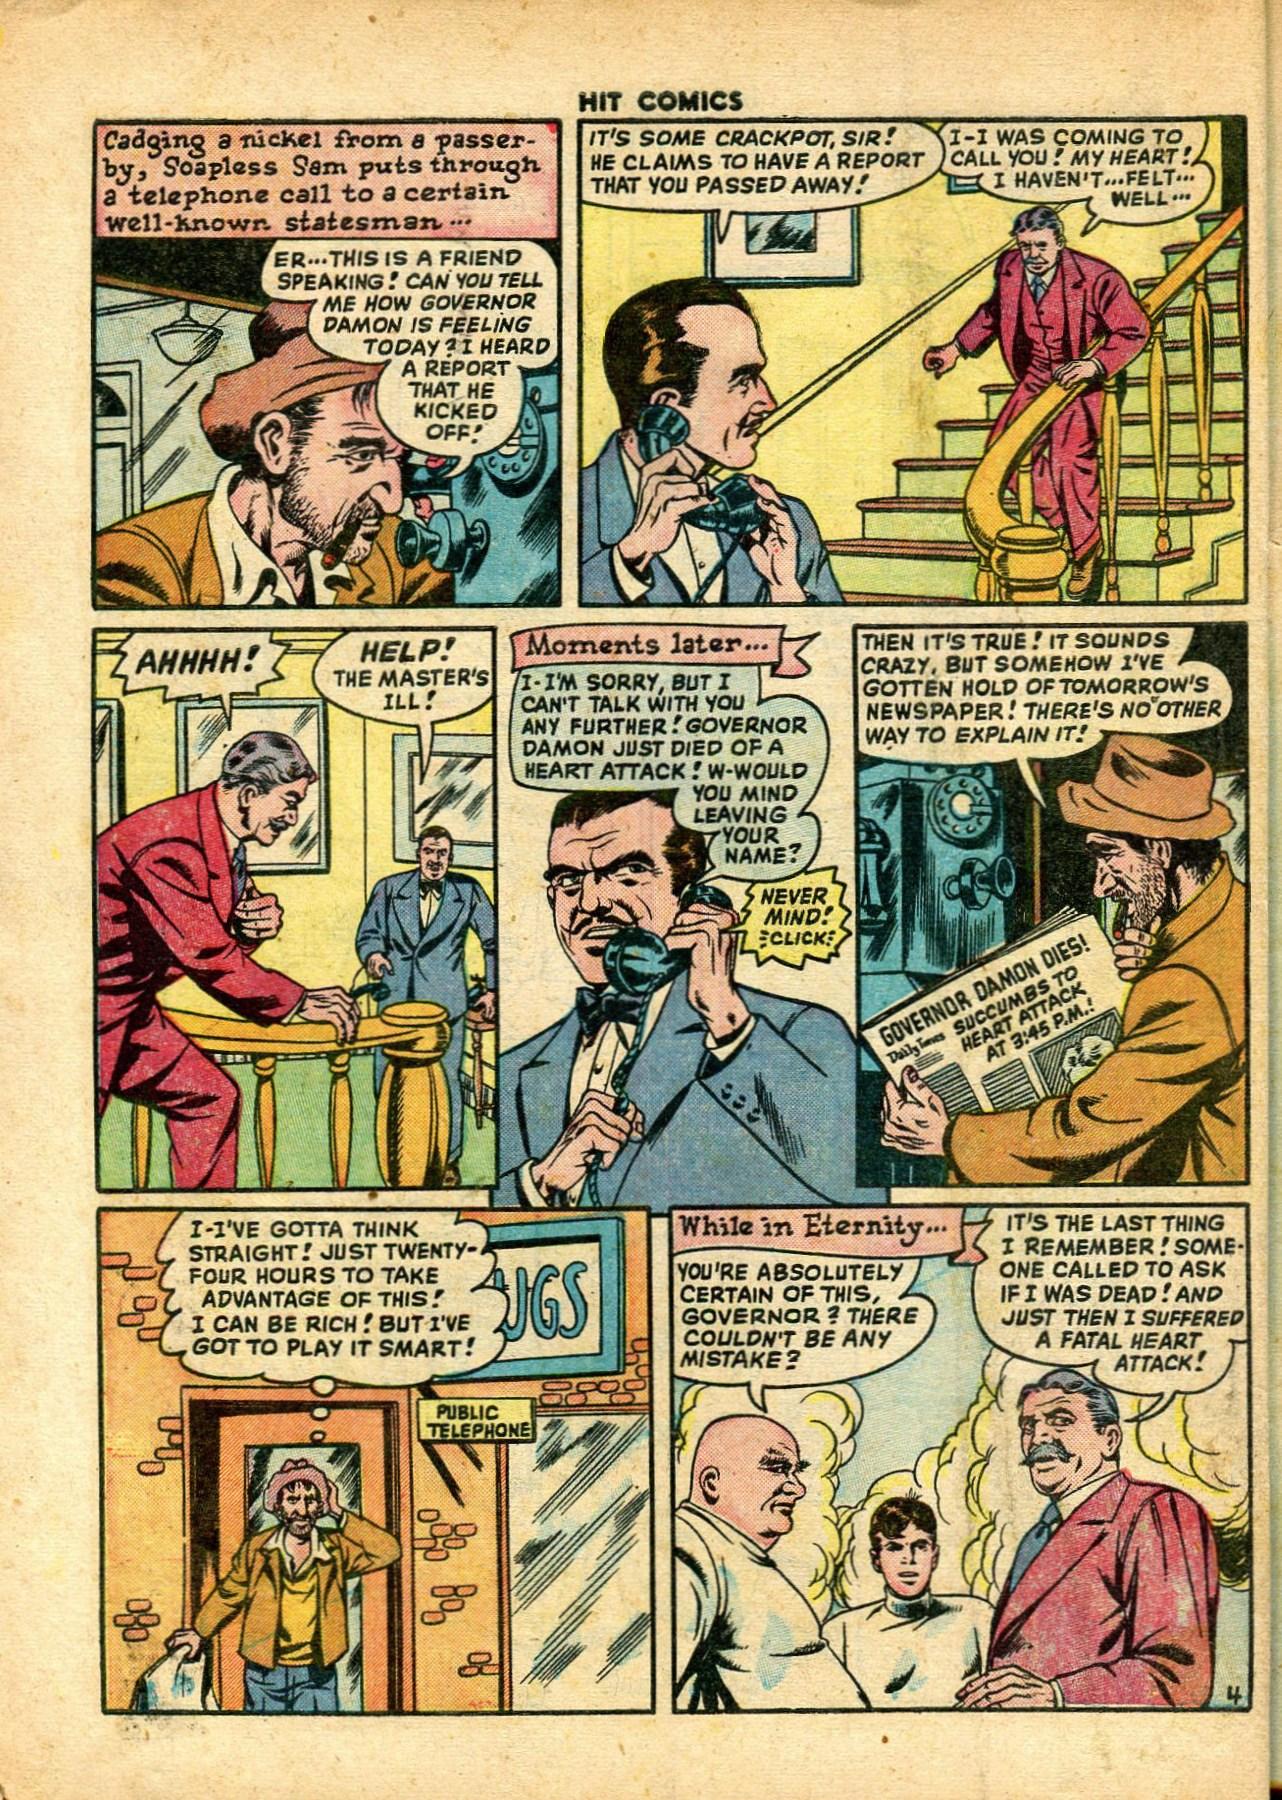 Read online Hit Comics comic -  Issue #59 - 6